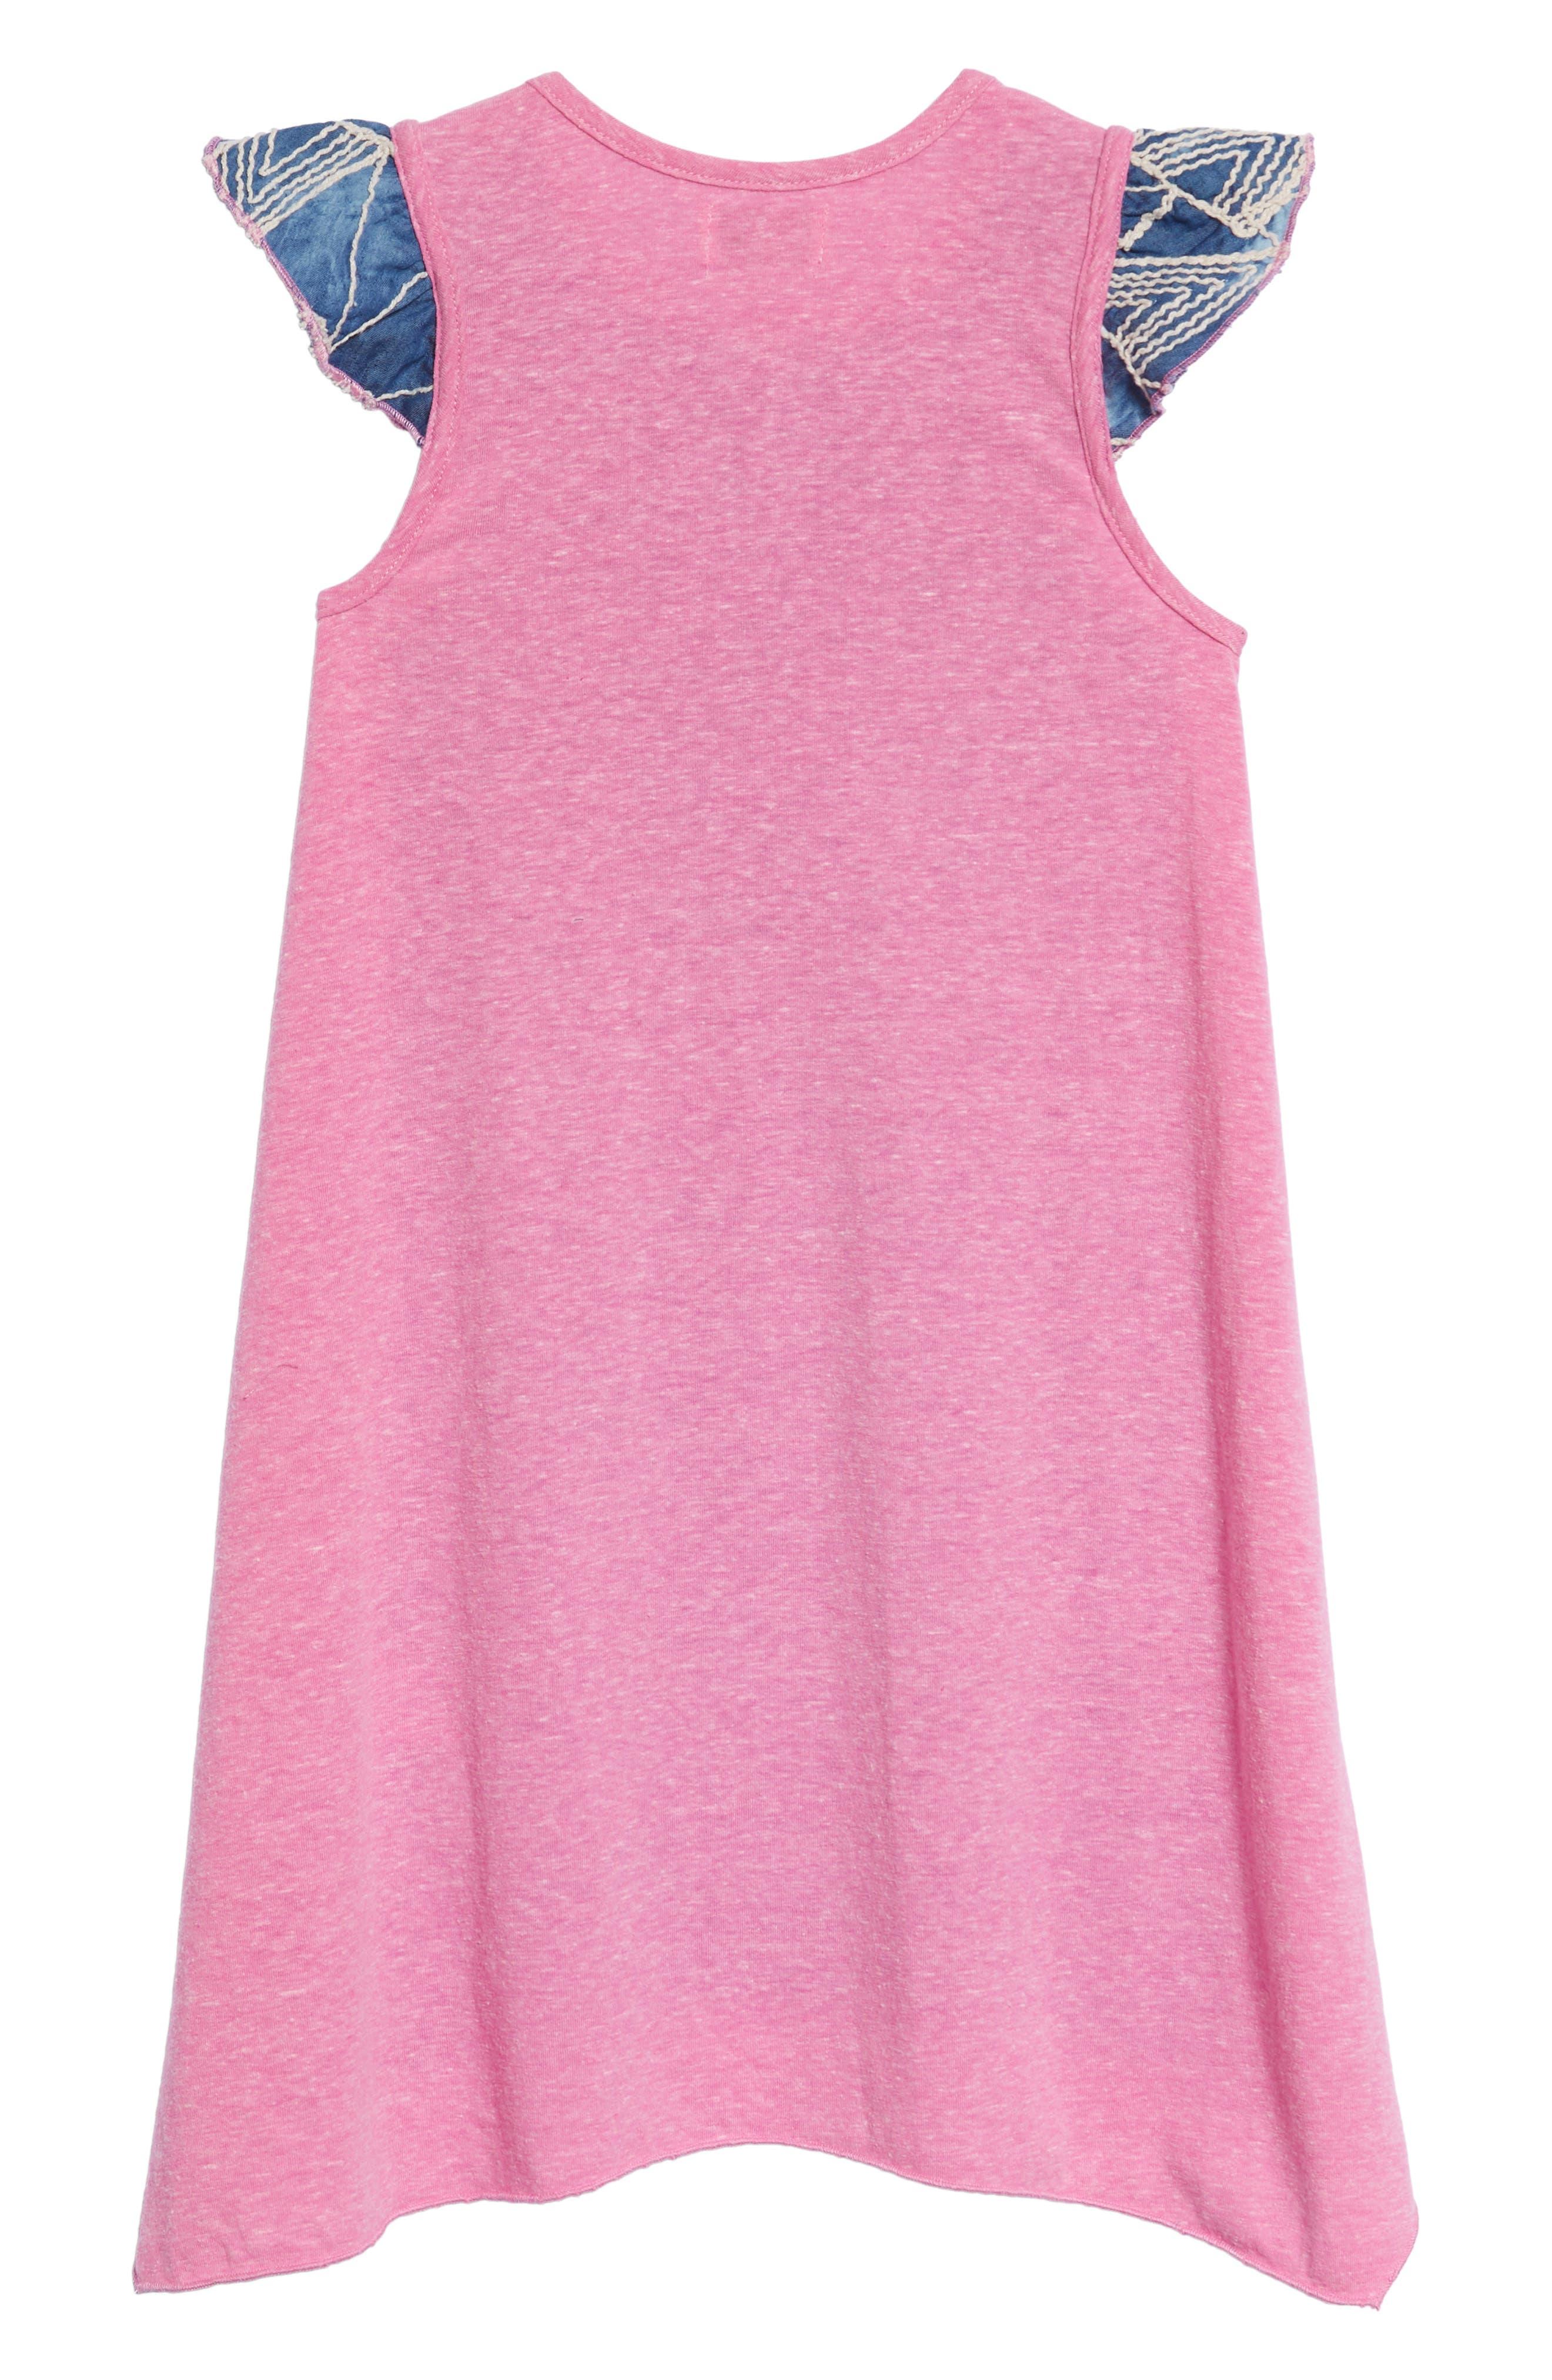 Alternate Image 2  - Mikki Miette India Embroidered Dress (Toddler Girls & Little Girls)